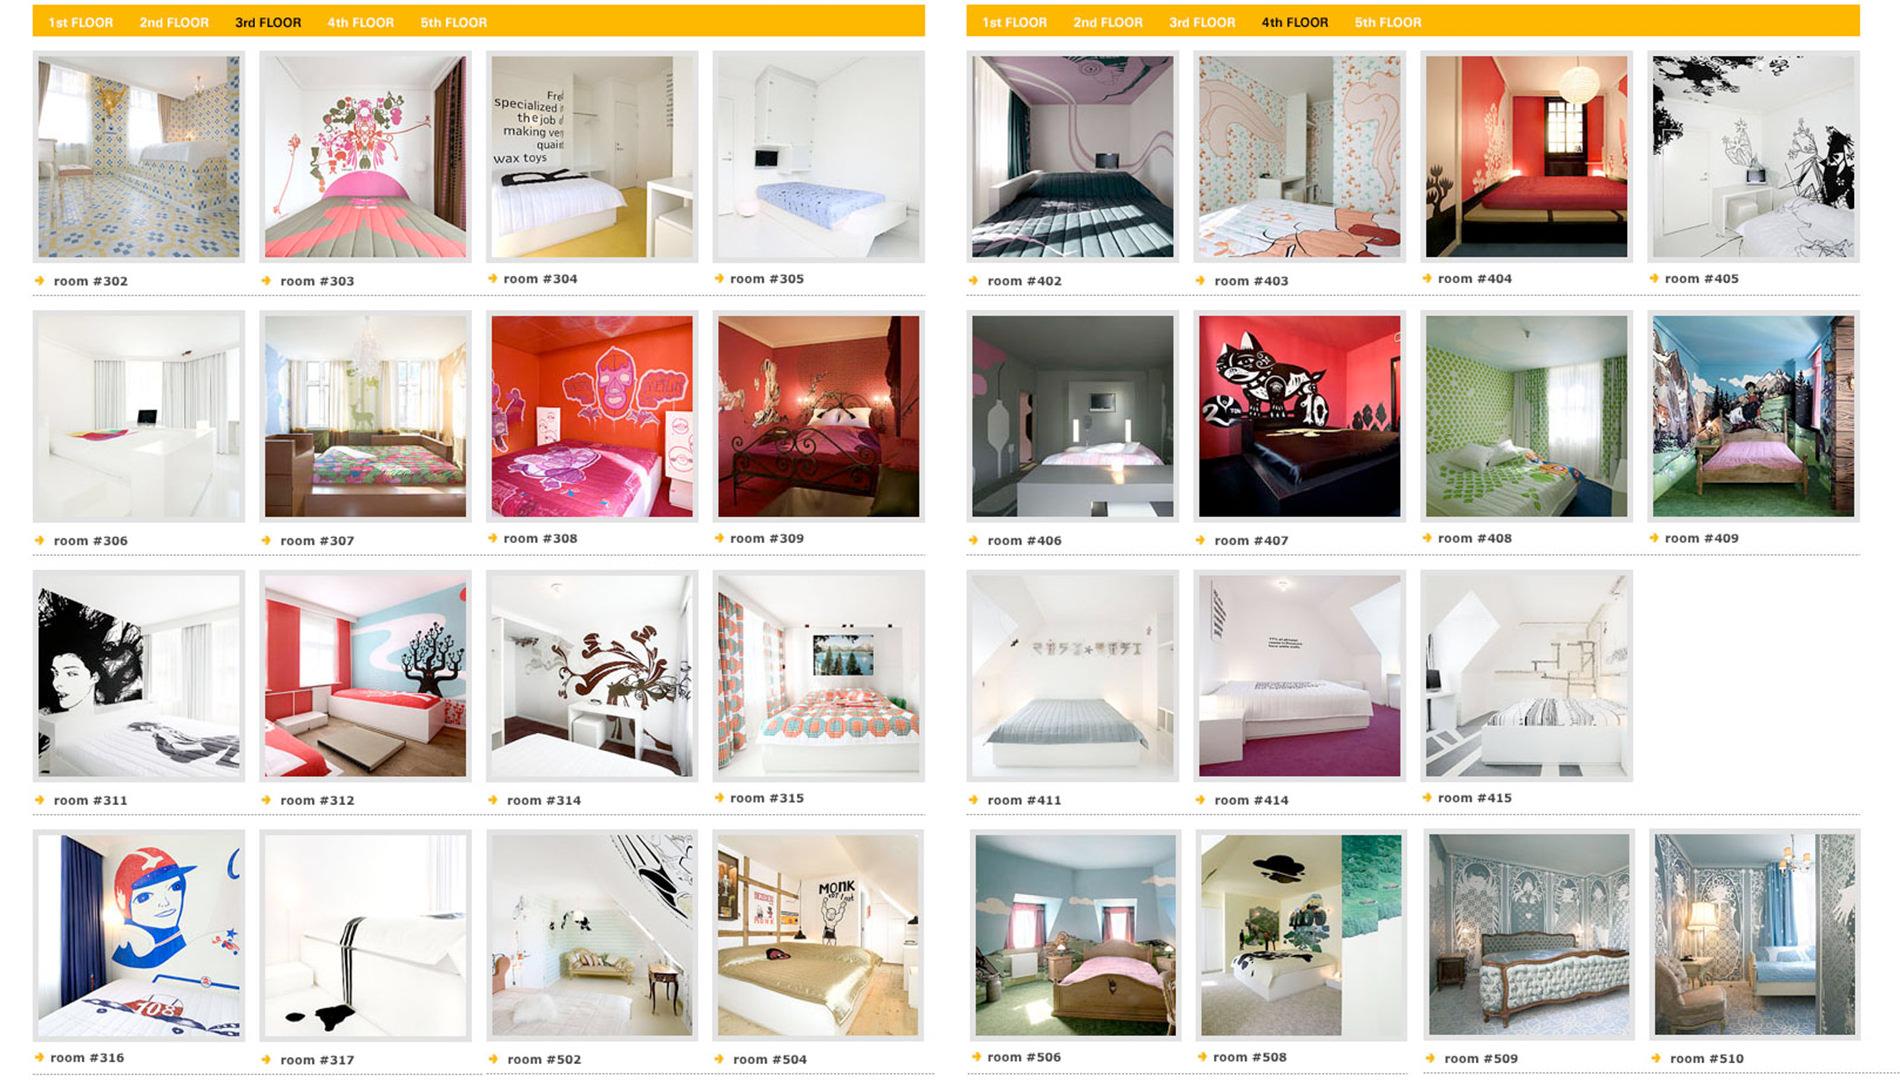 Messe Design Live Kommunikation Kopenhagen VW Projekt Fox Hotel Zimmer Going Places EventLabs